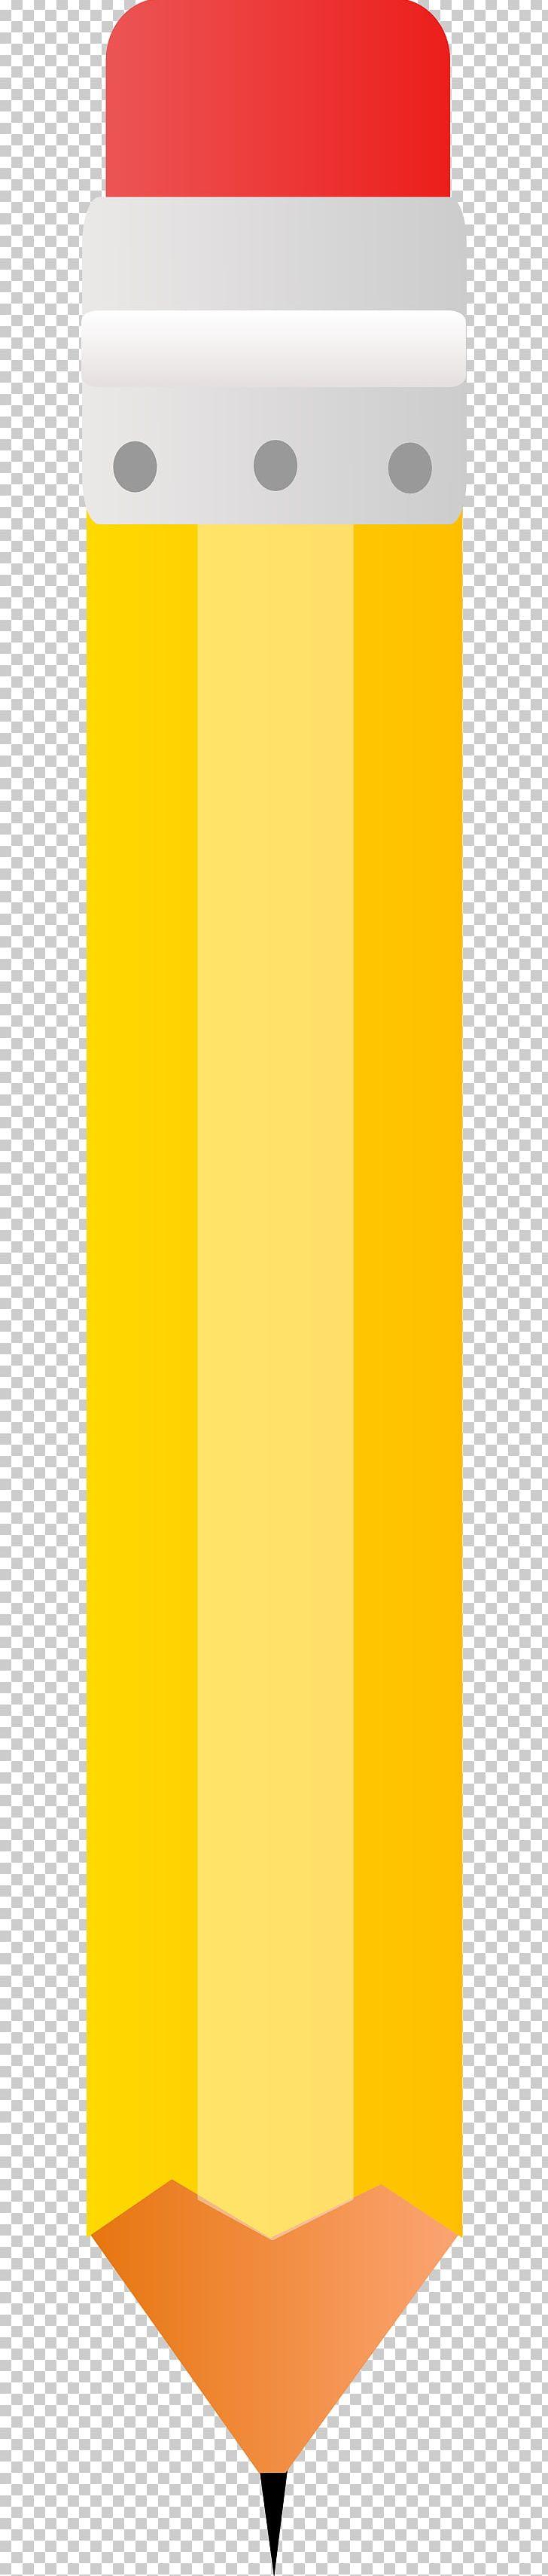 Pencil vertical. Drawing horizontal and png